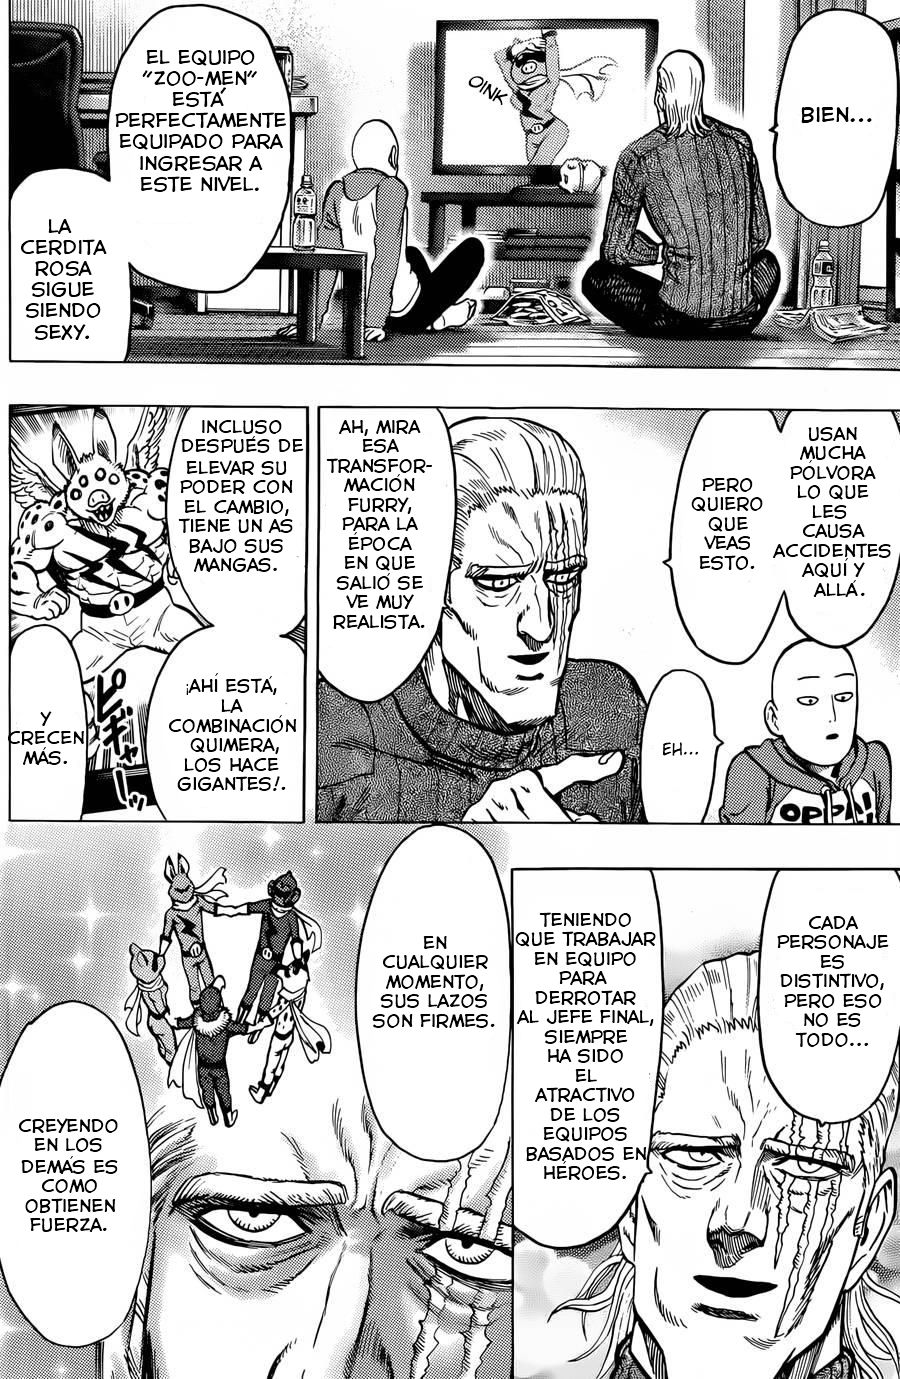 http://c5.ninemanga.com/es_manga/21/14805/461429/cad1a66cb34f6458f7d893a2ccd3646c.jpg Page 4